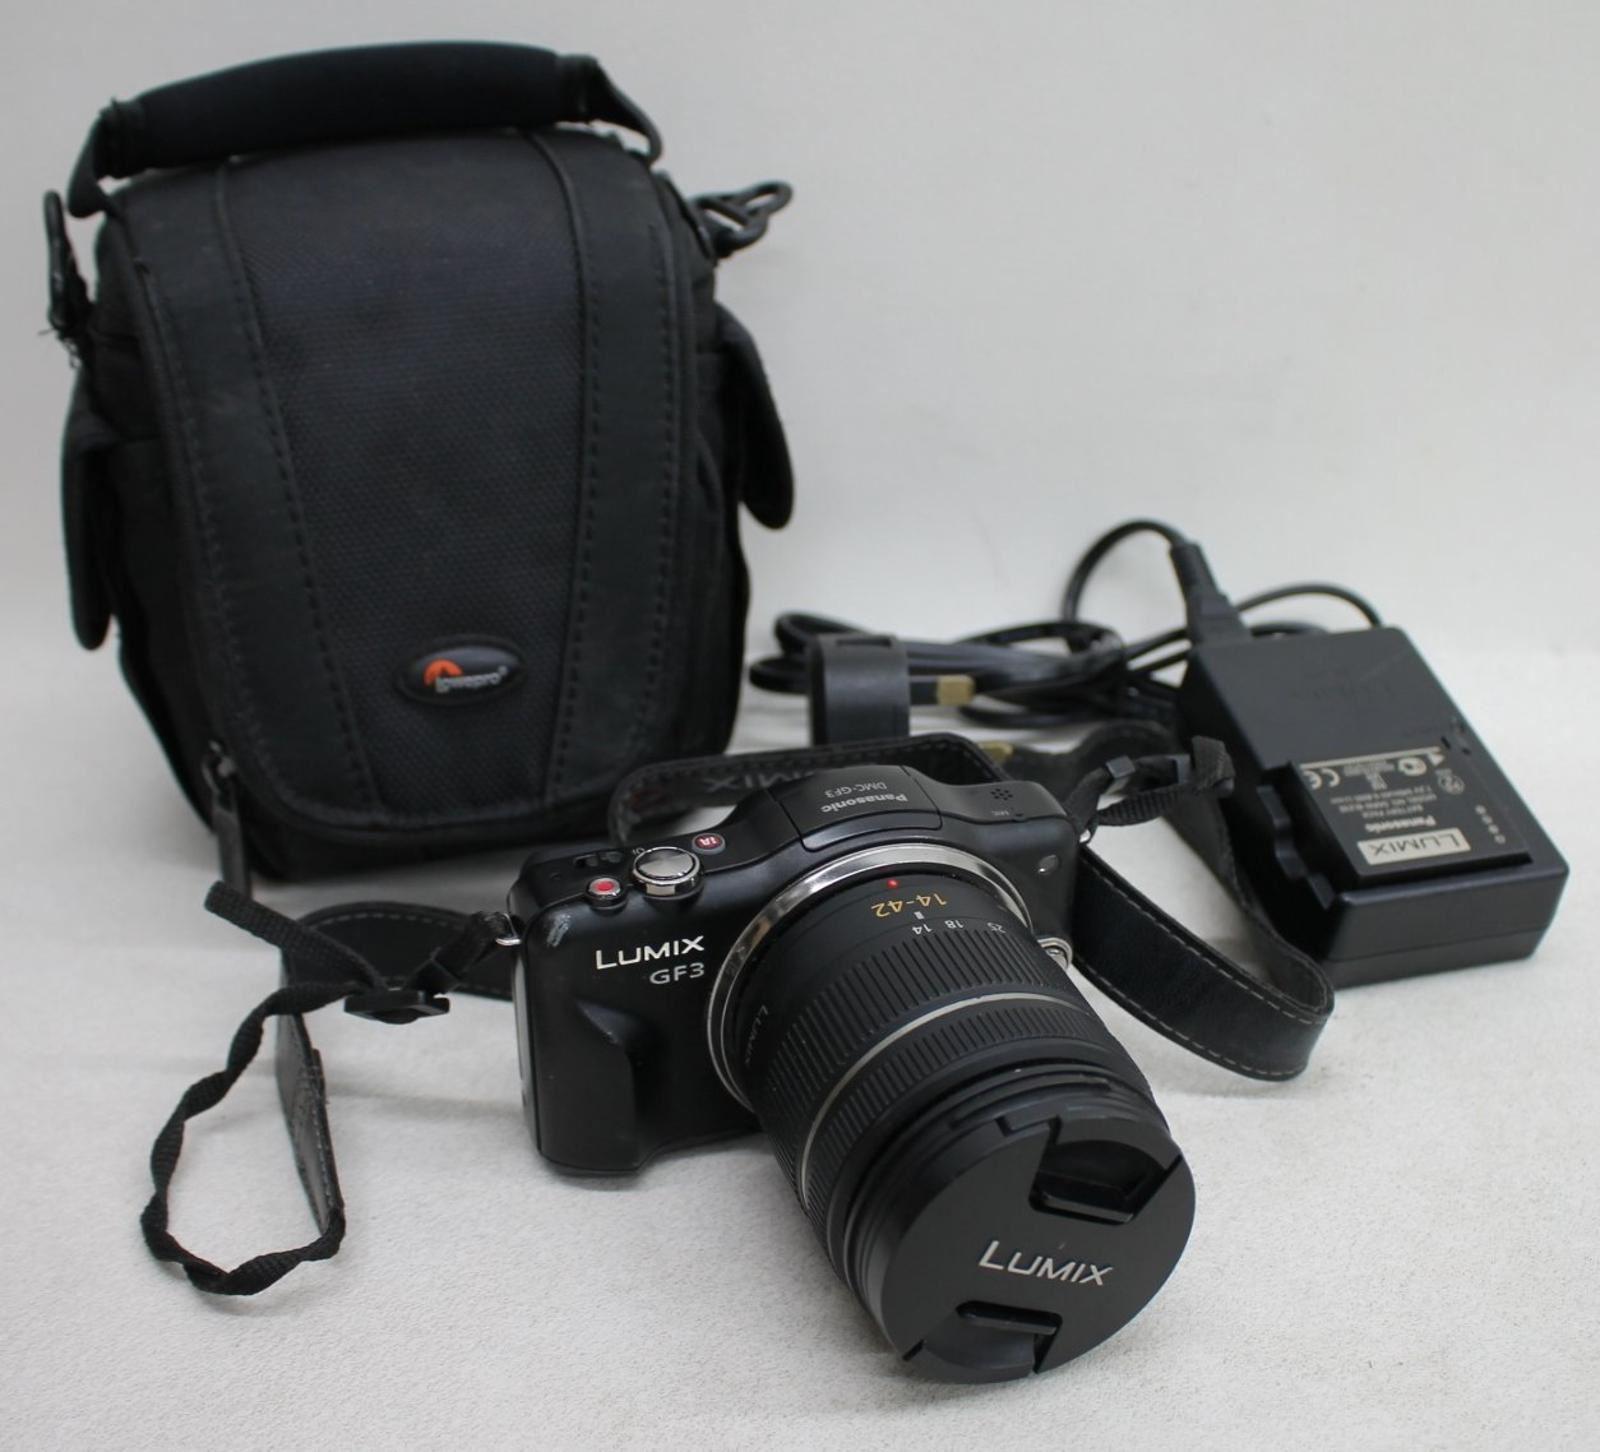 PANASONIC-Lumix-DMC-GF3-12-1MP-Compact-Camera-w-14-42mm-G-Vario-f-3-5-5-6-Lens